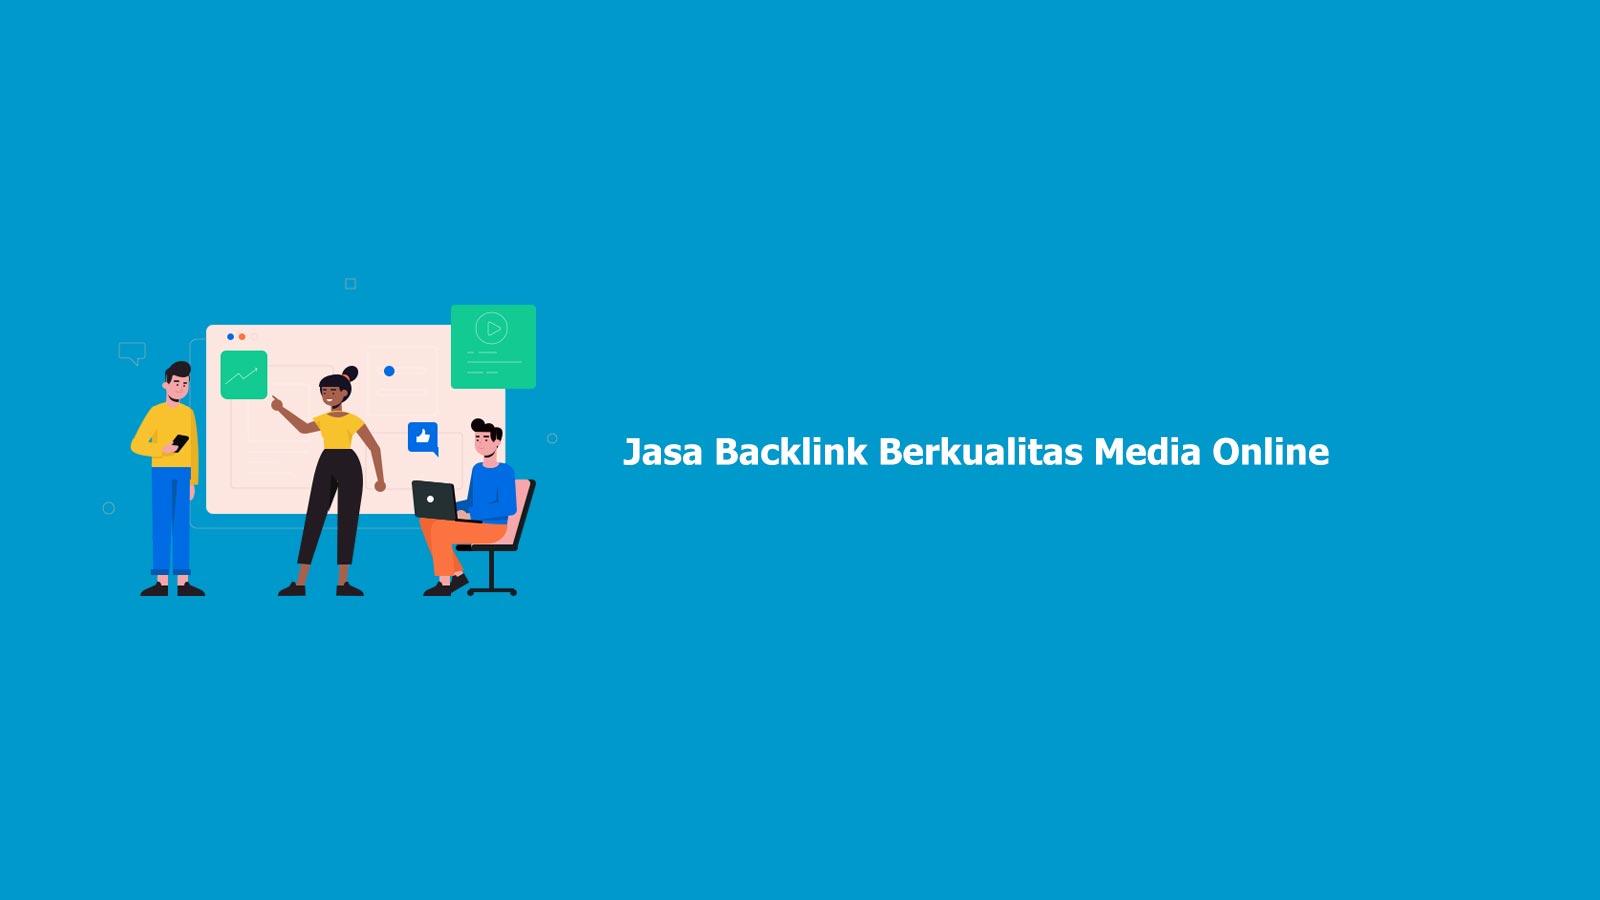 jasa backlink berkualitas media online nasional